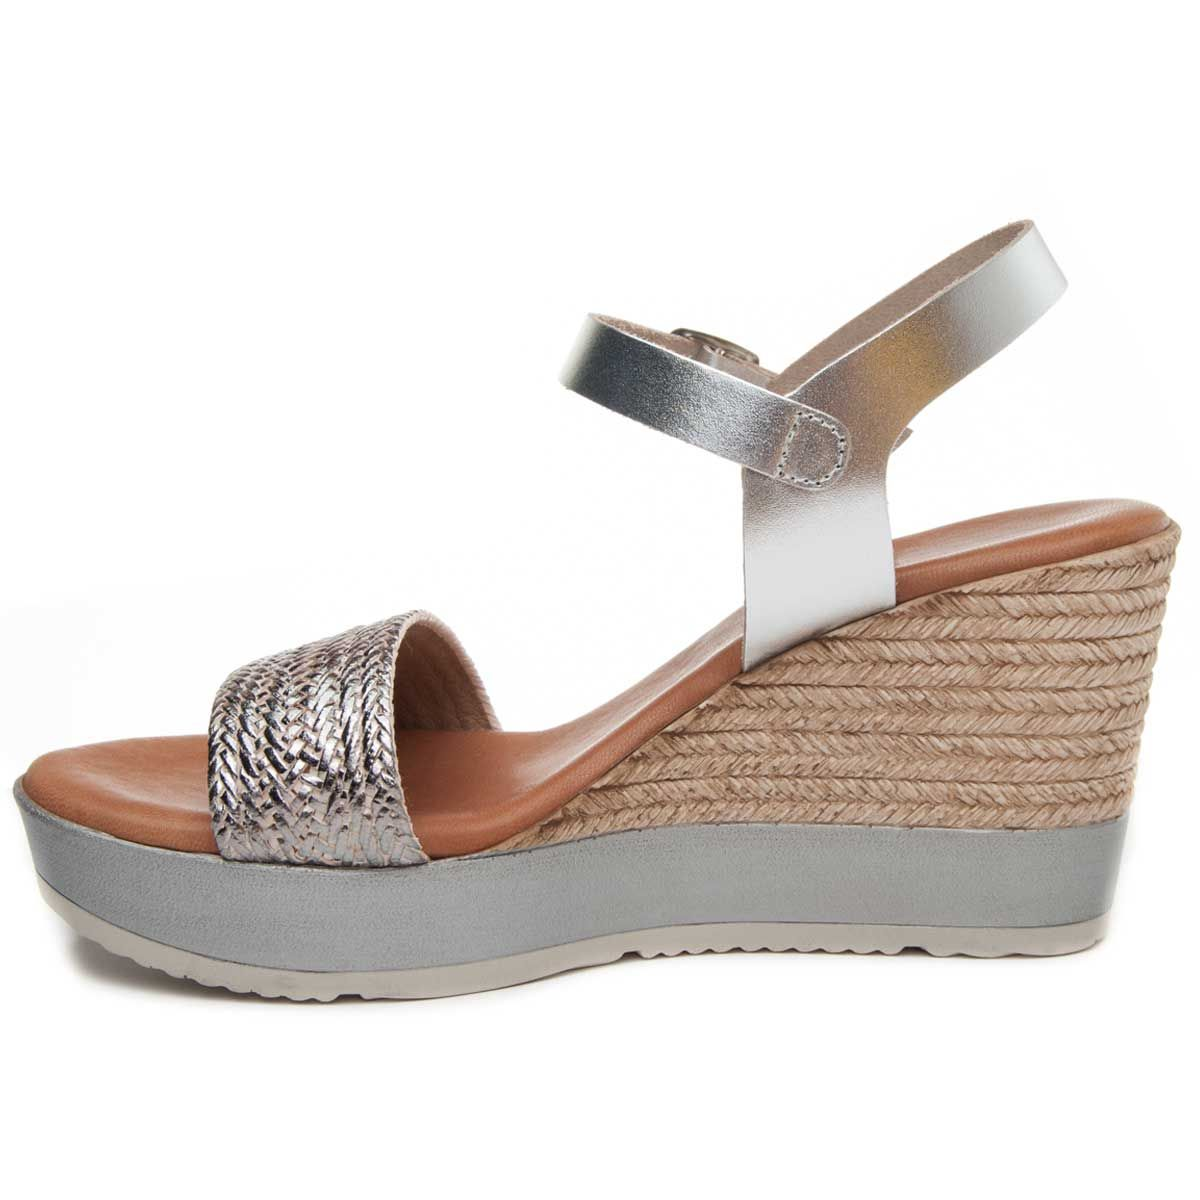 Purapiel Ankle Strap Wedge Espadrille in Silver